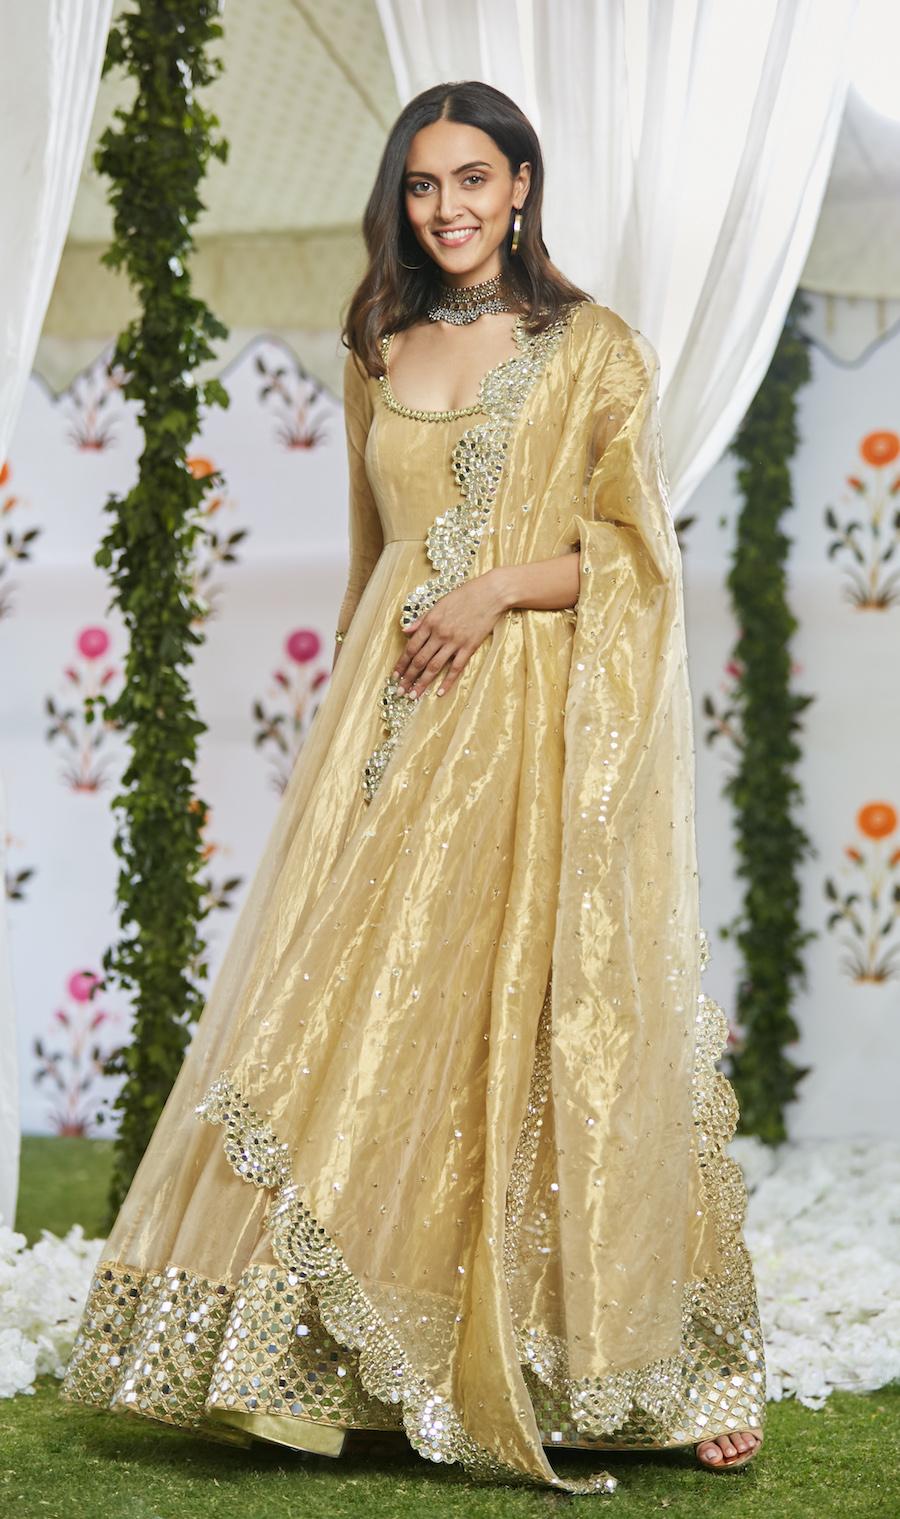 Golden Floor Length Anarkali- Abhinav Mishra, Shahpur Jat Boutiques.